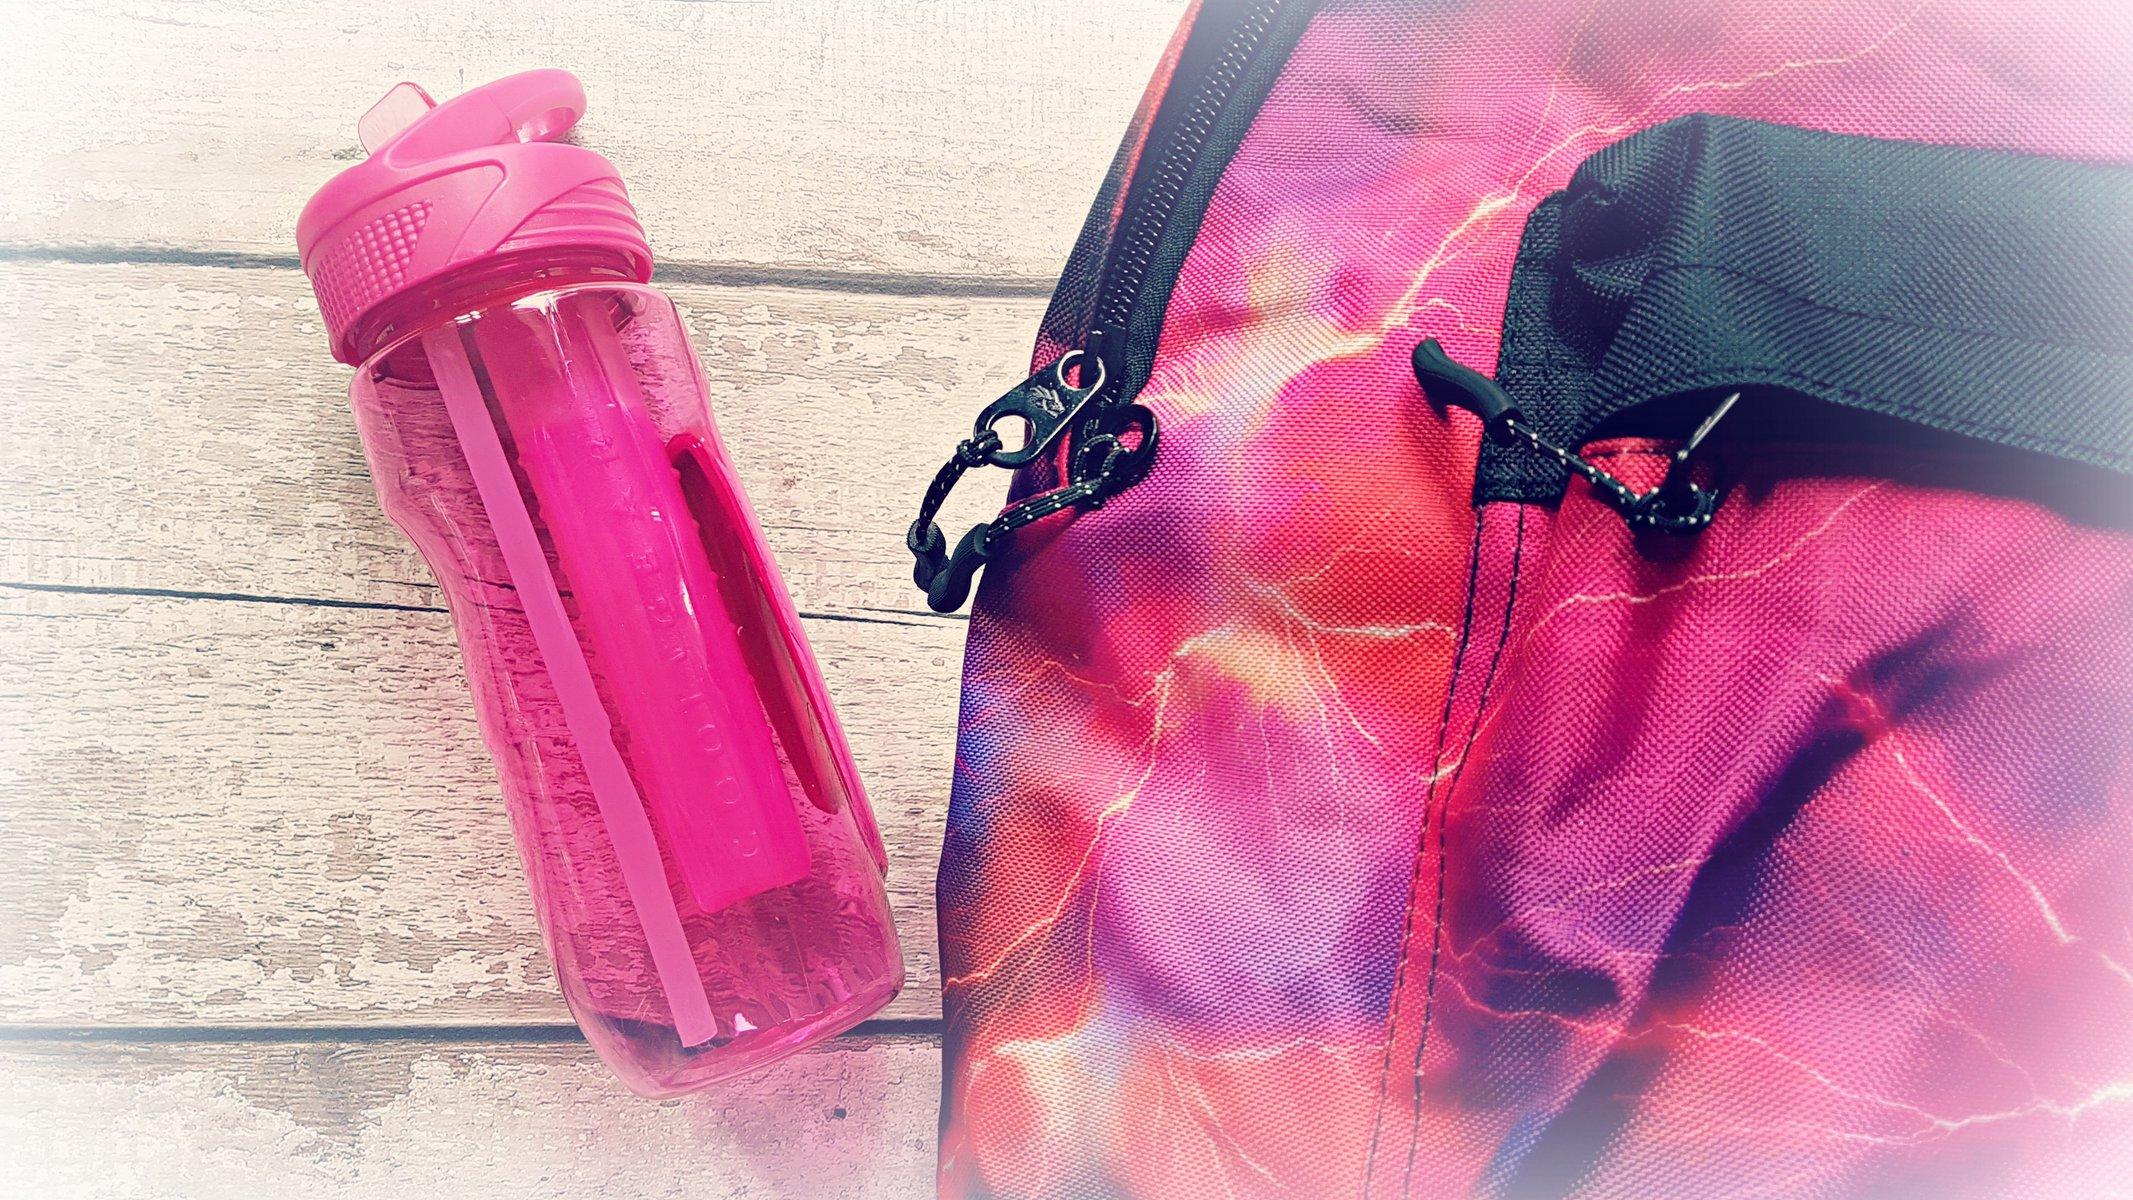 a pink lightening design backpack and a pink drink bottle